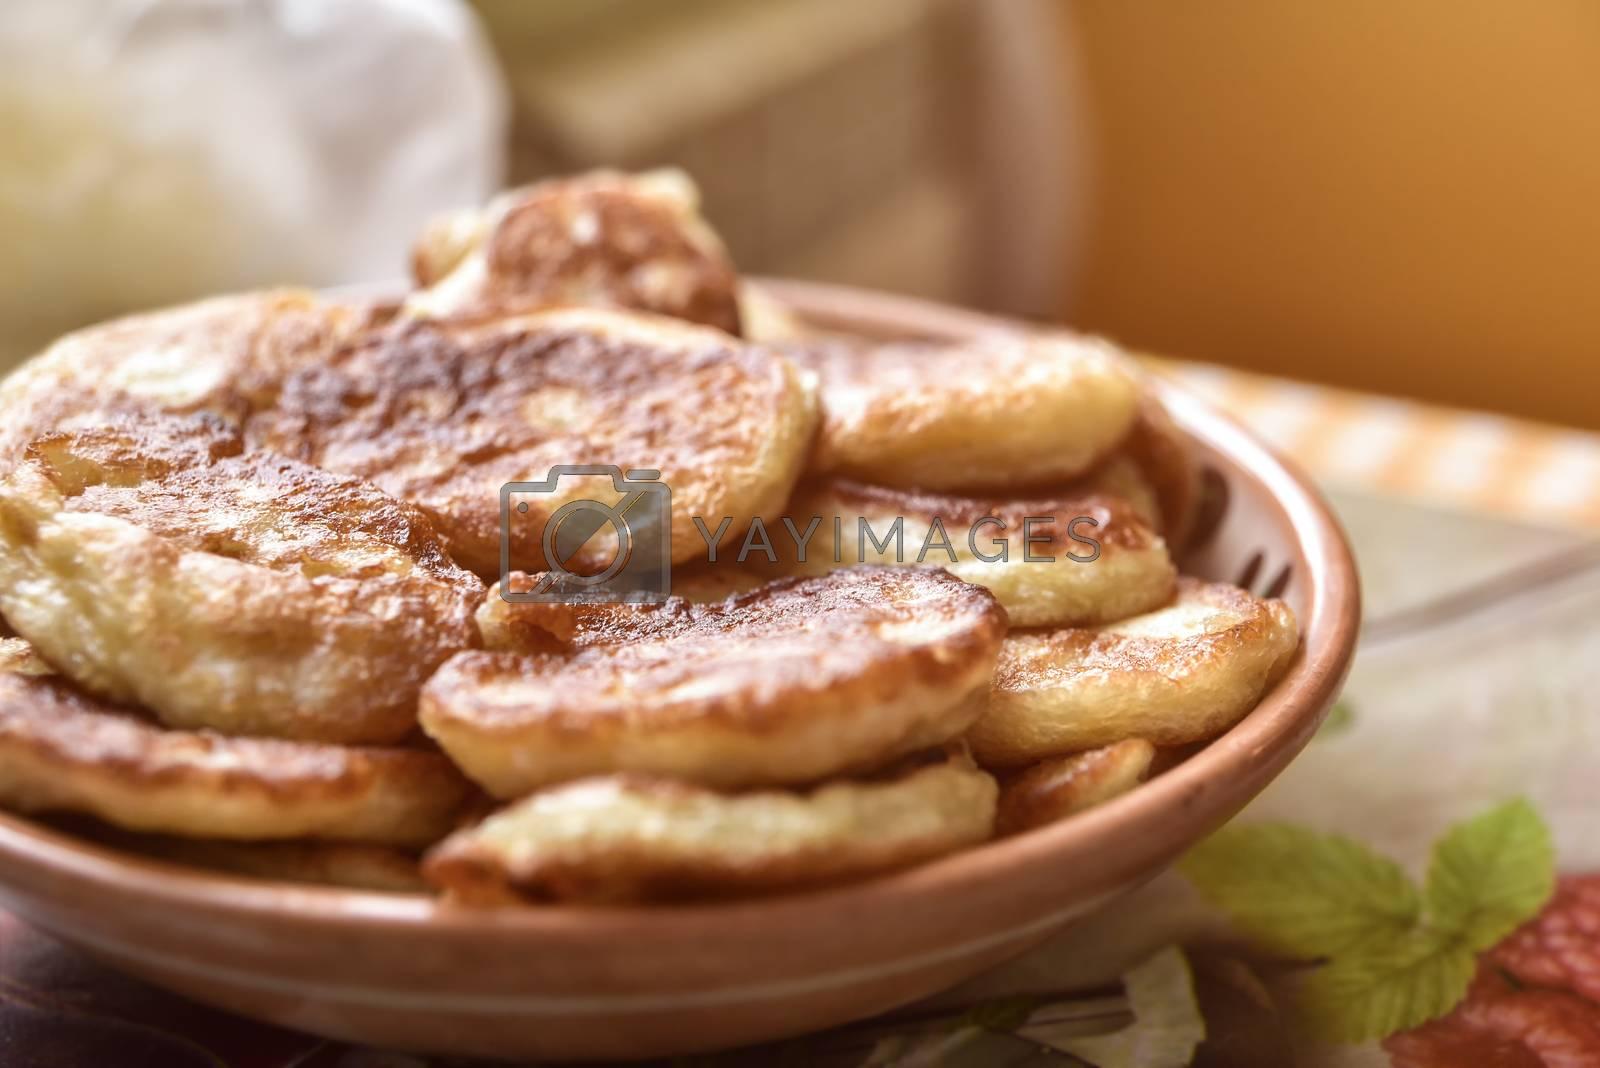 freshly made pancakes. Breakfast ideas. American food,Good morning by Nickstock